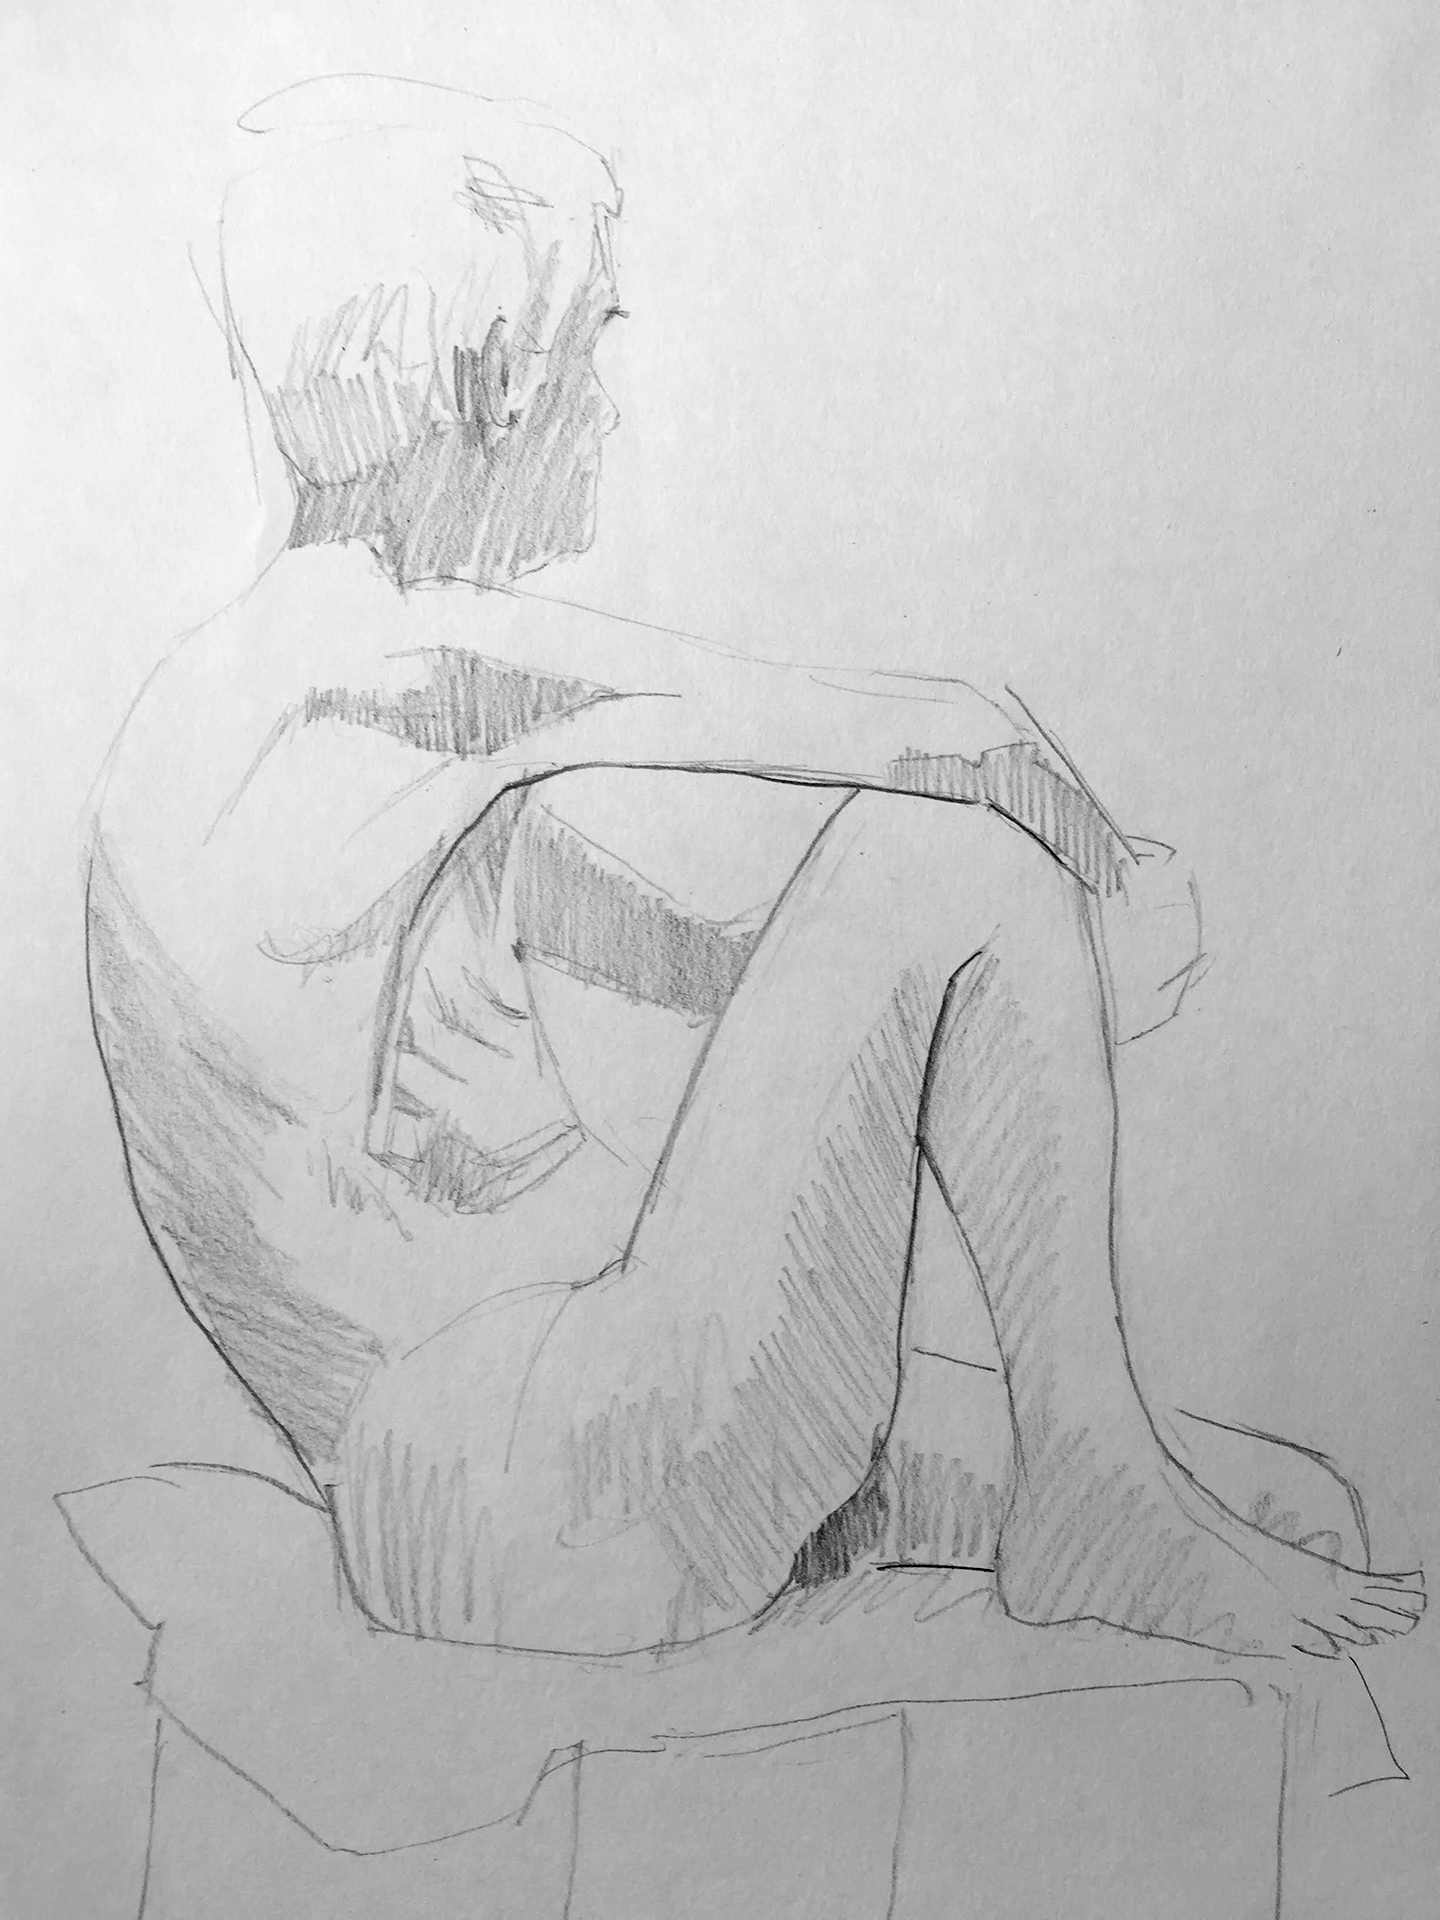 Life Drawing Sketch 3, 7/6/18